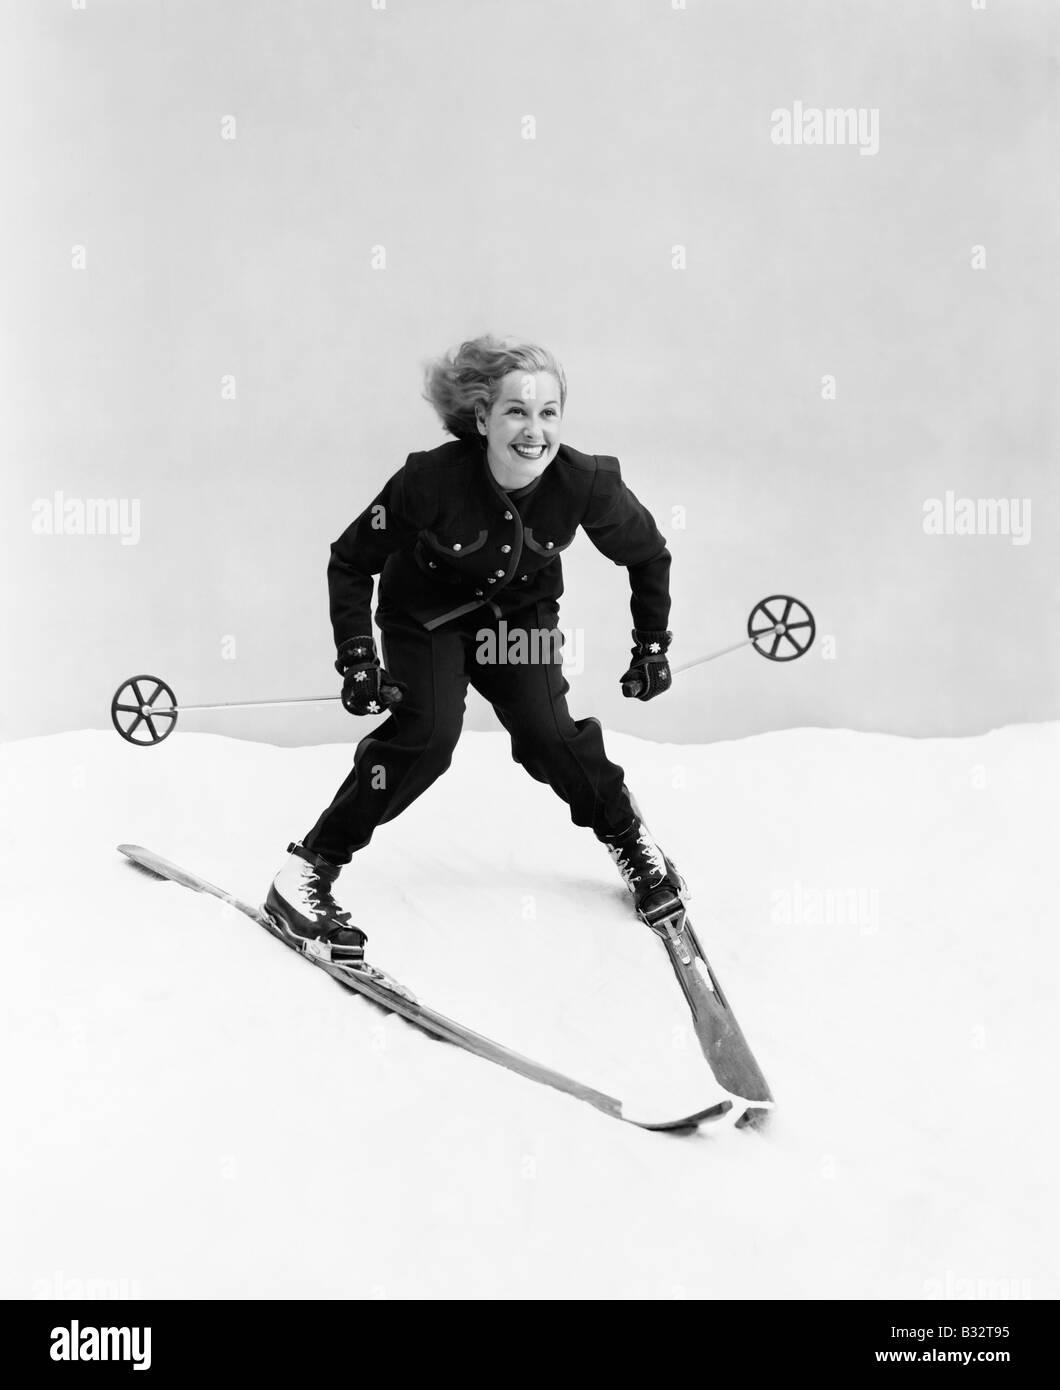 Female skier skiing downhill - Stock Image